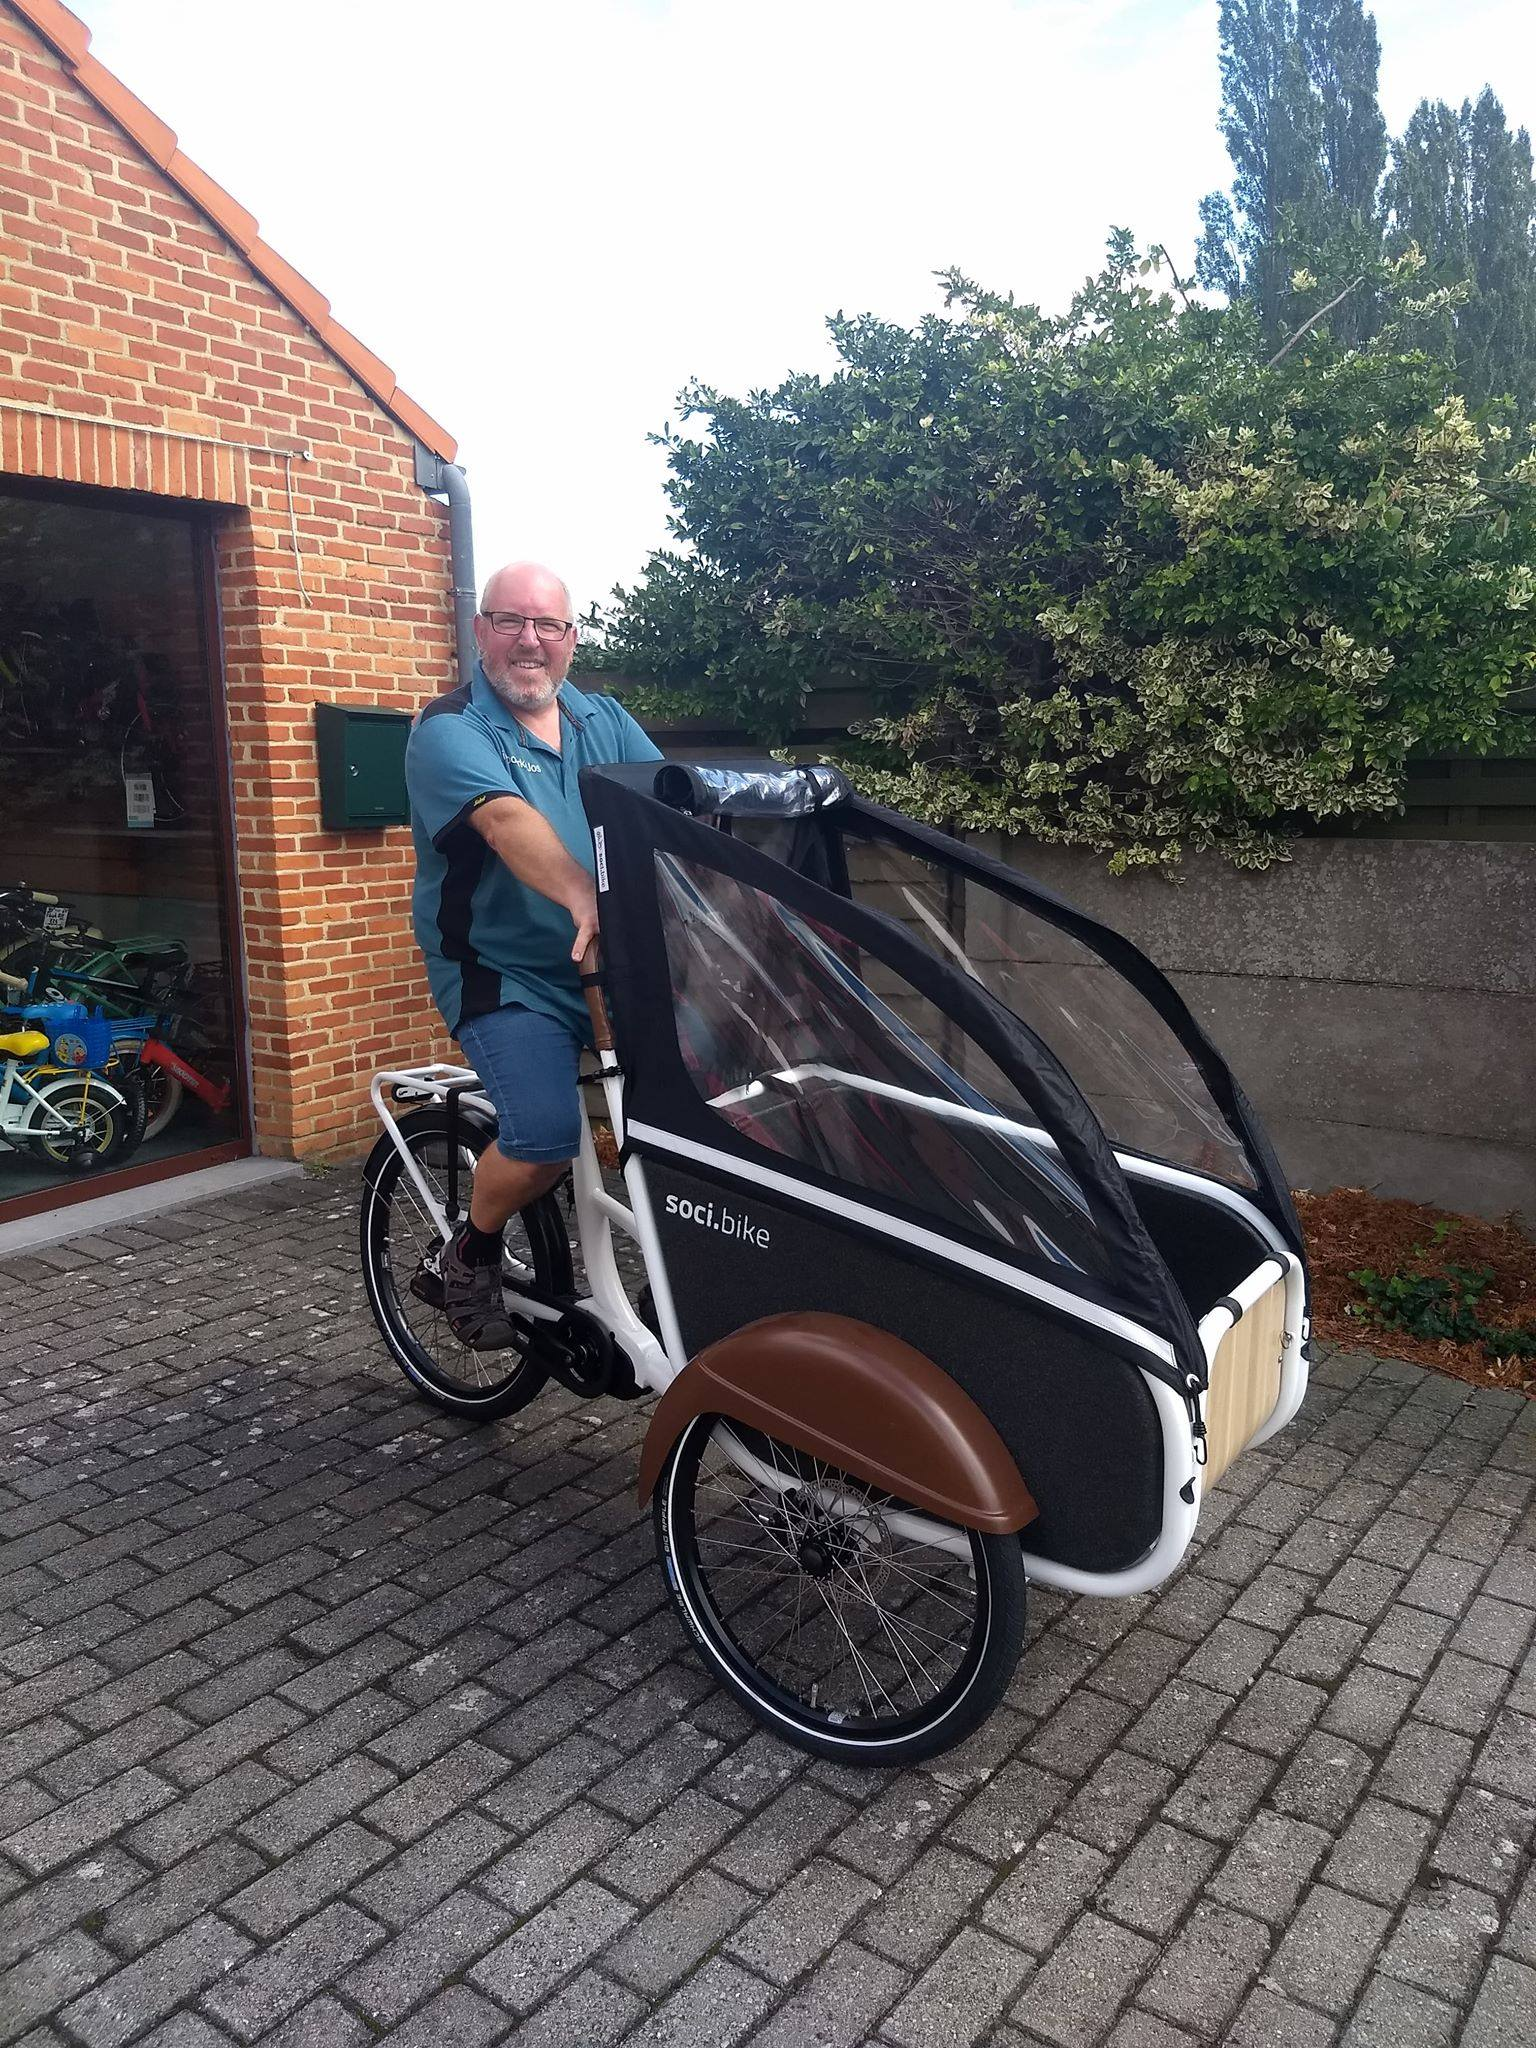 Over soci.bike ambassadeur Fietsboerke Jos